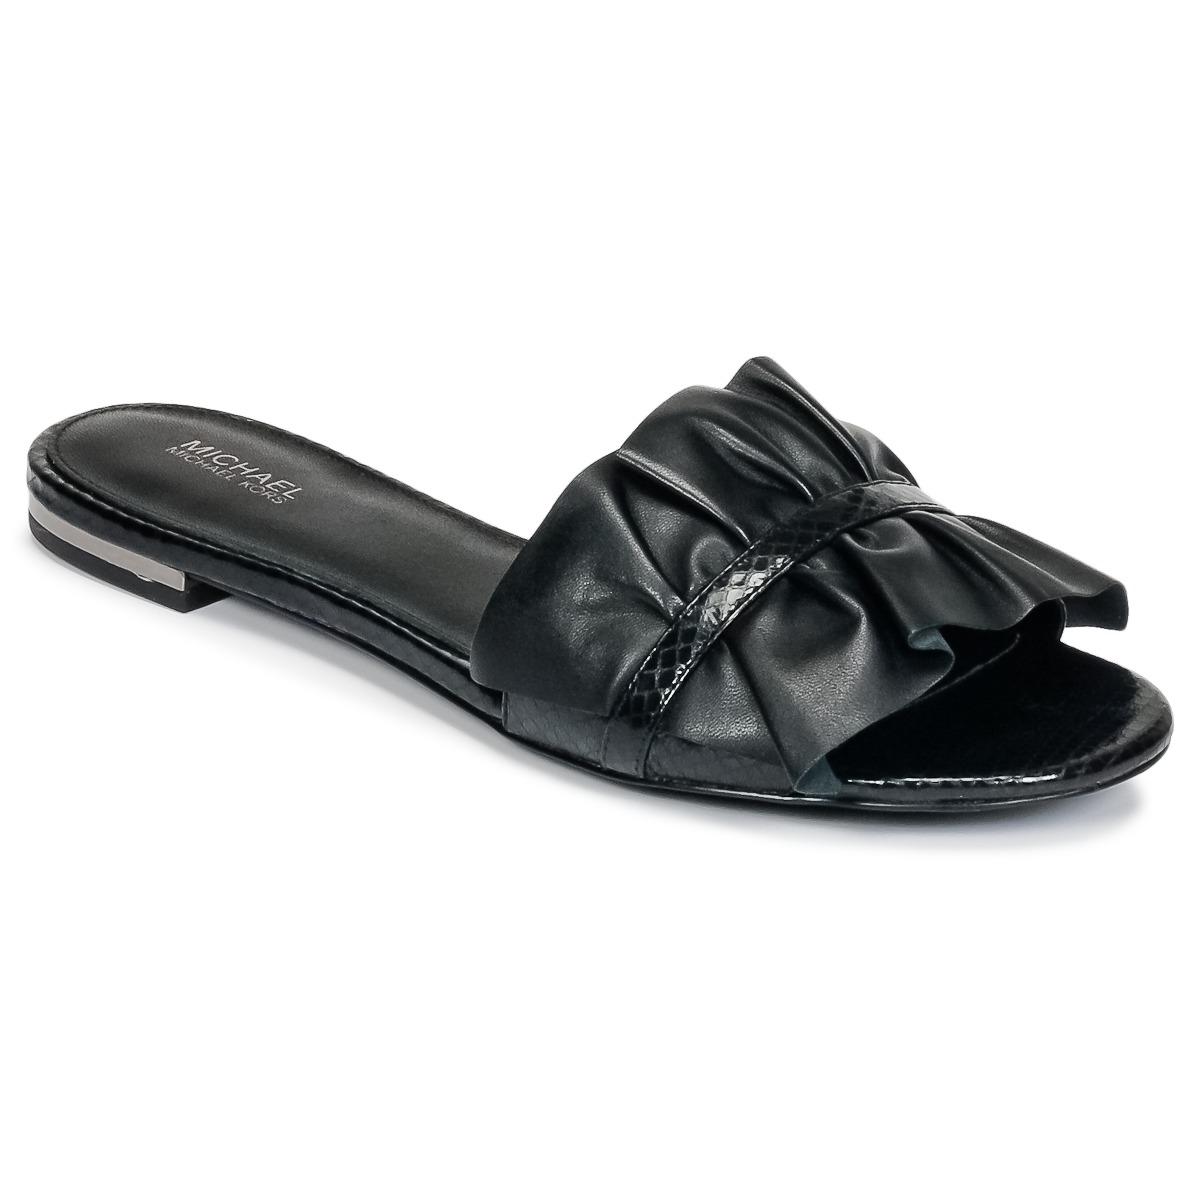 d1c38bfd9e85 Michael Michael Kors Womens BELLA SLIDE Open Toe Casual Slide Sandals